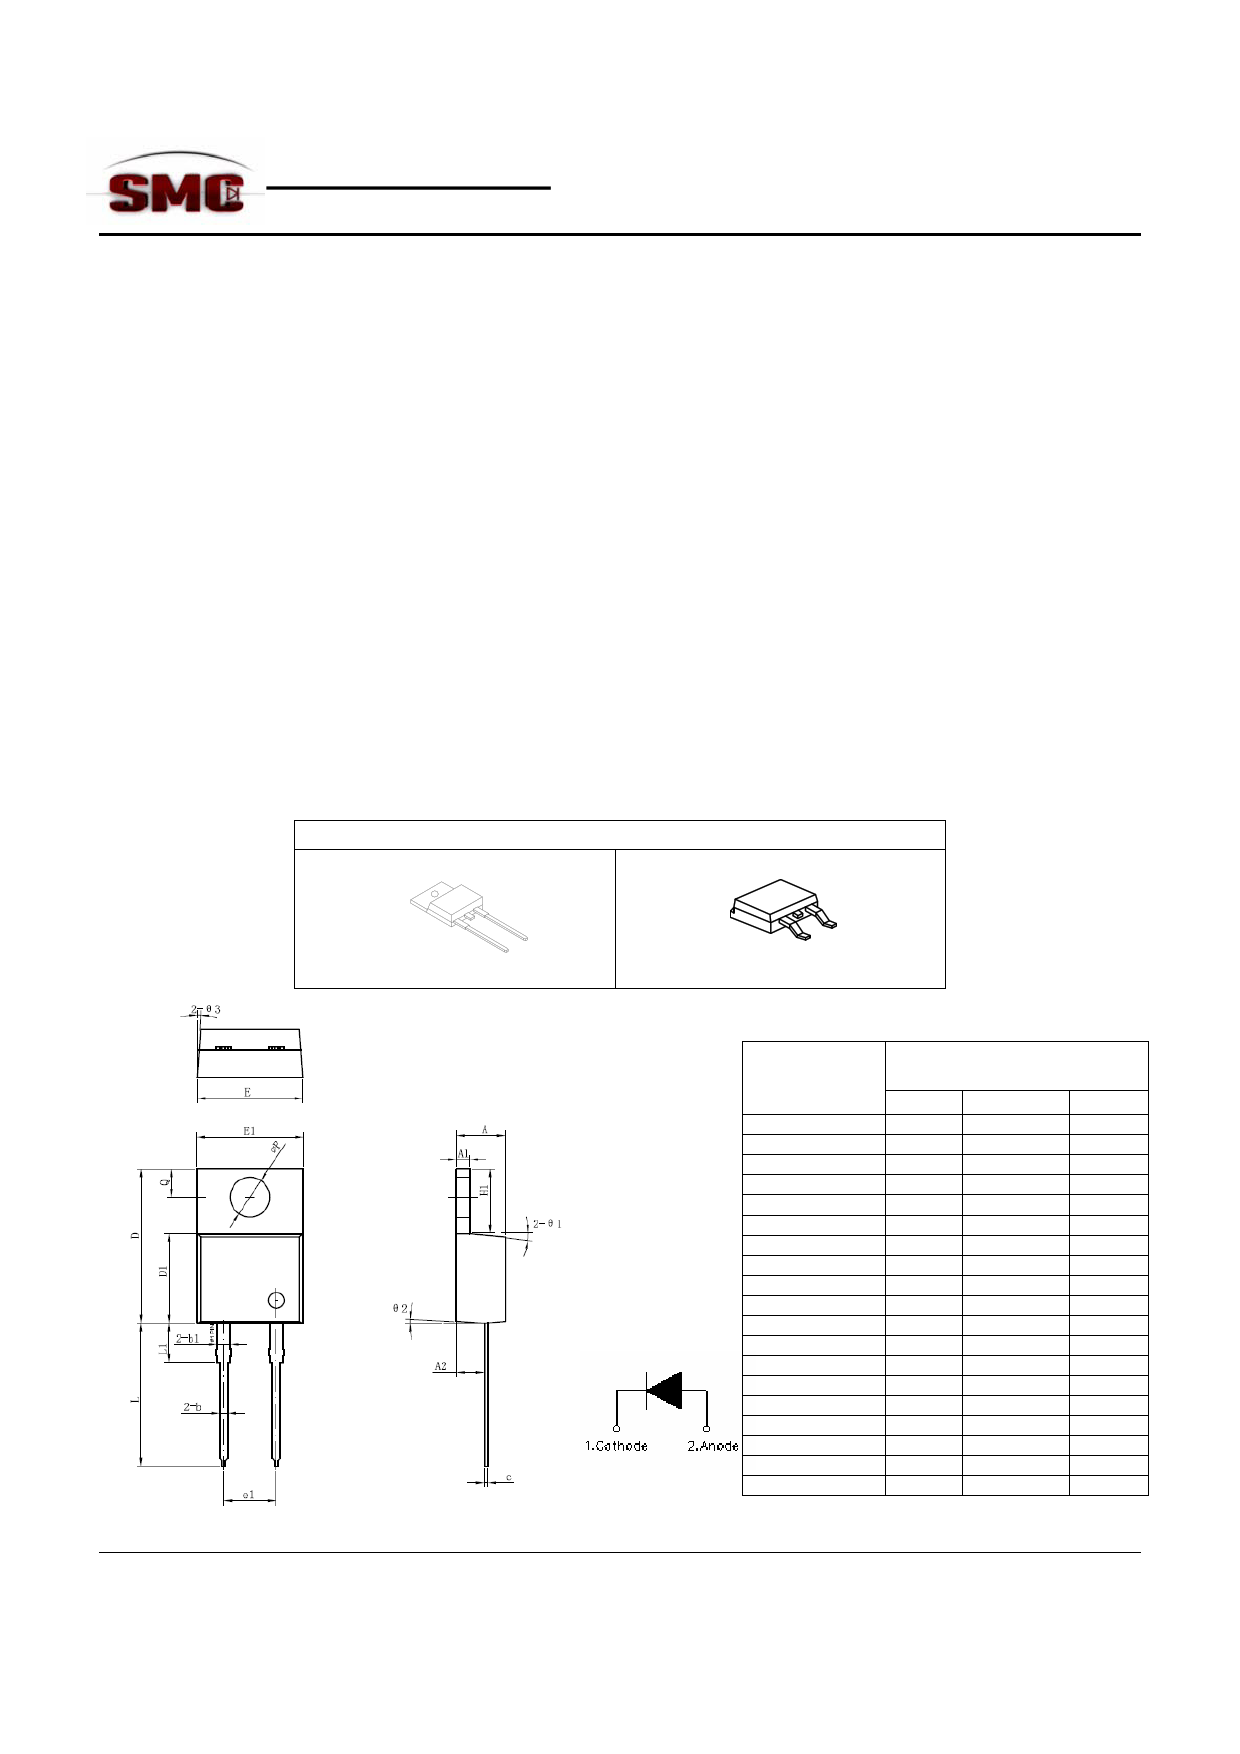 10TQ040 Datasheet, 10TQ040 PDF,ピン配置, 機能